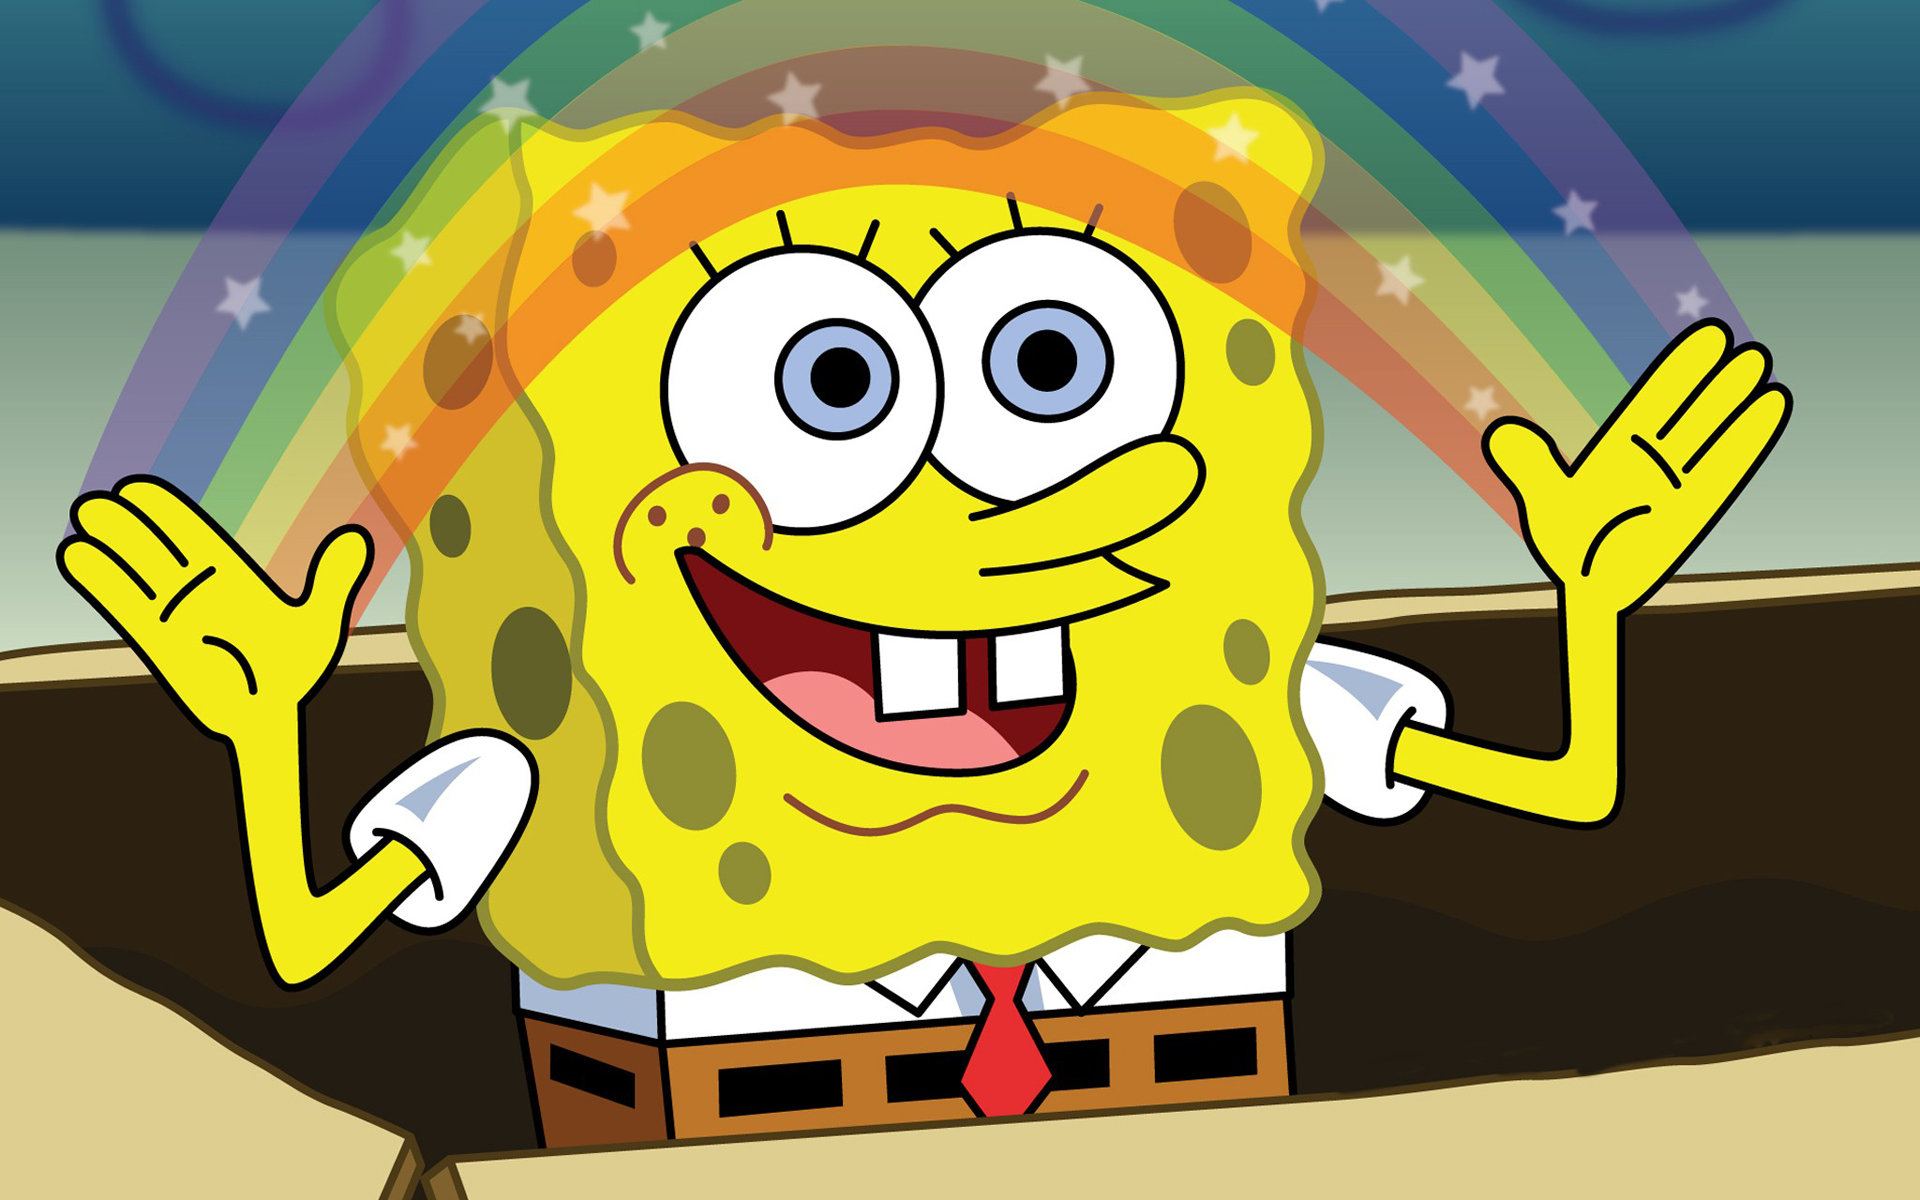 free spongebob squarepants high quality background id:135699 for hd